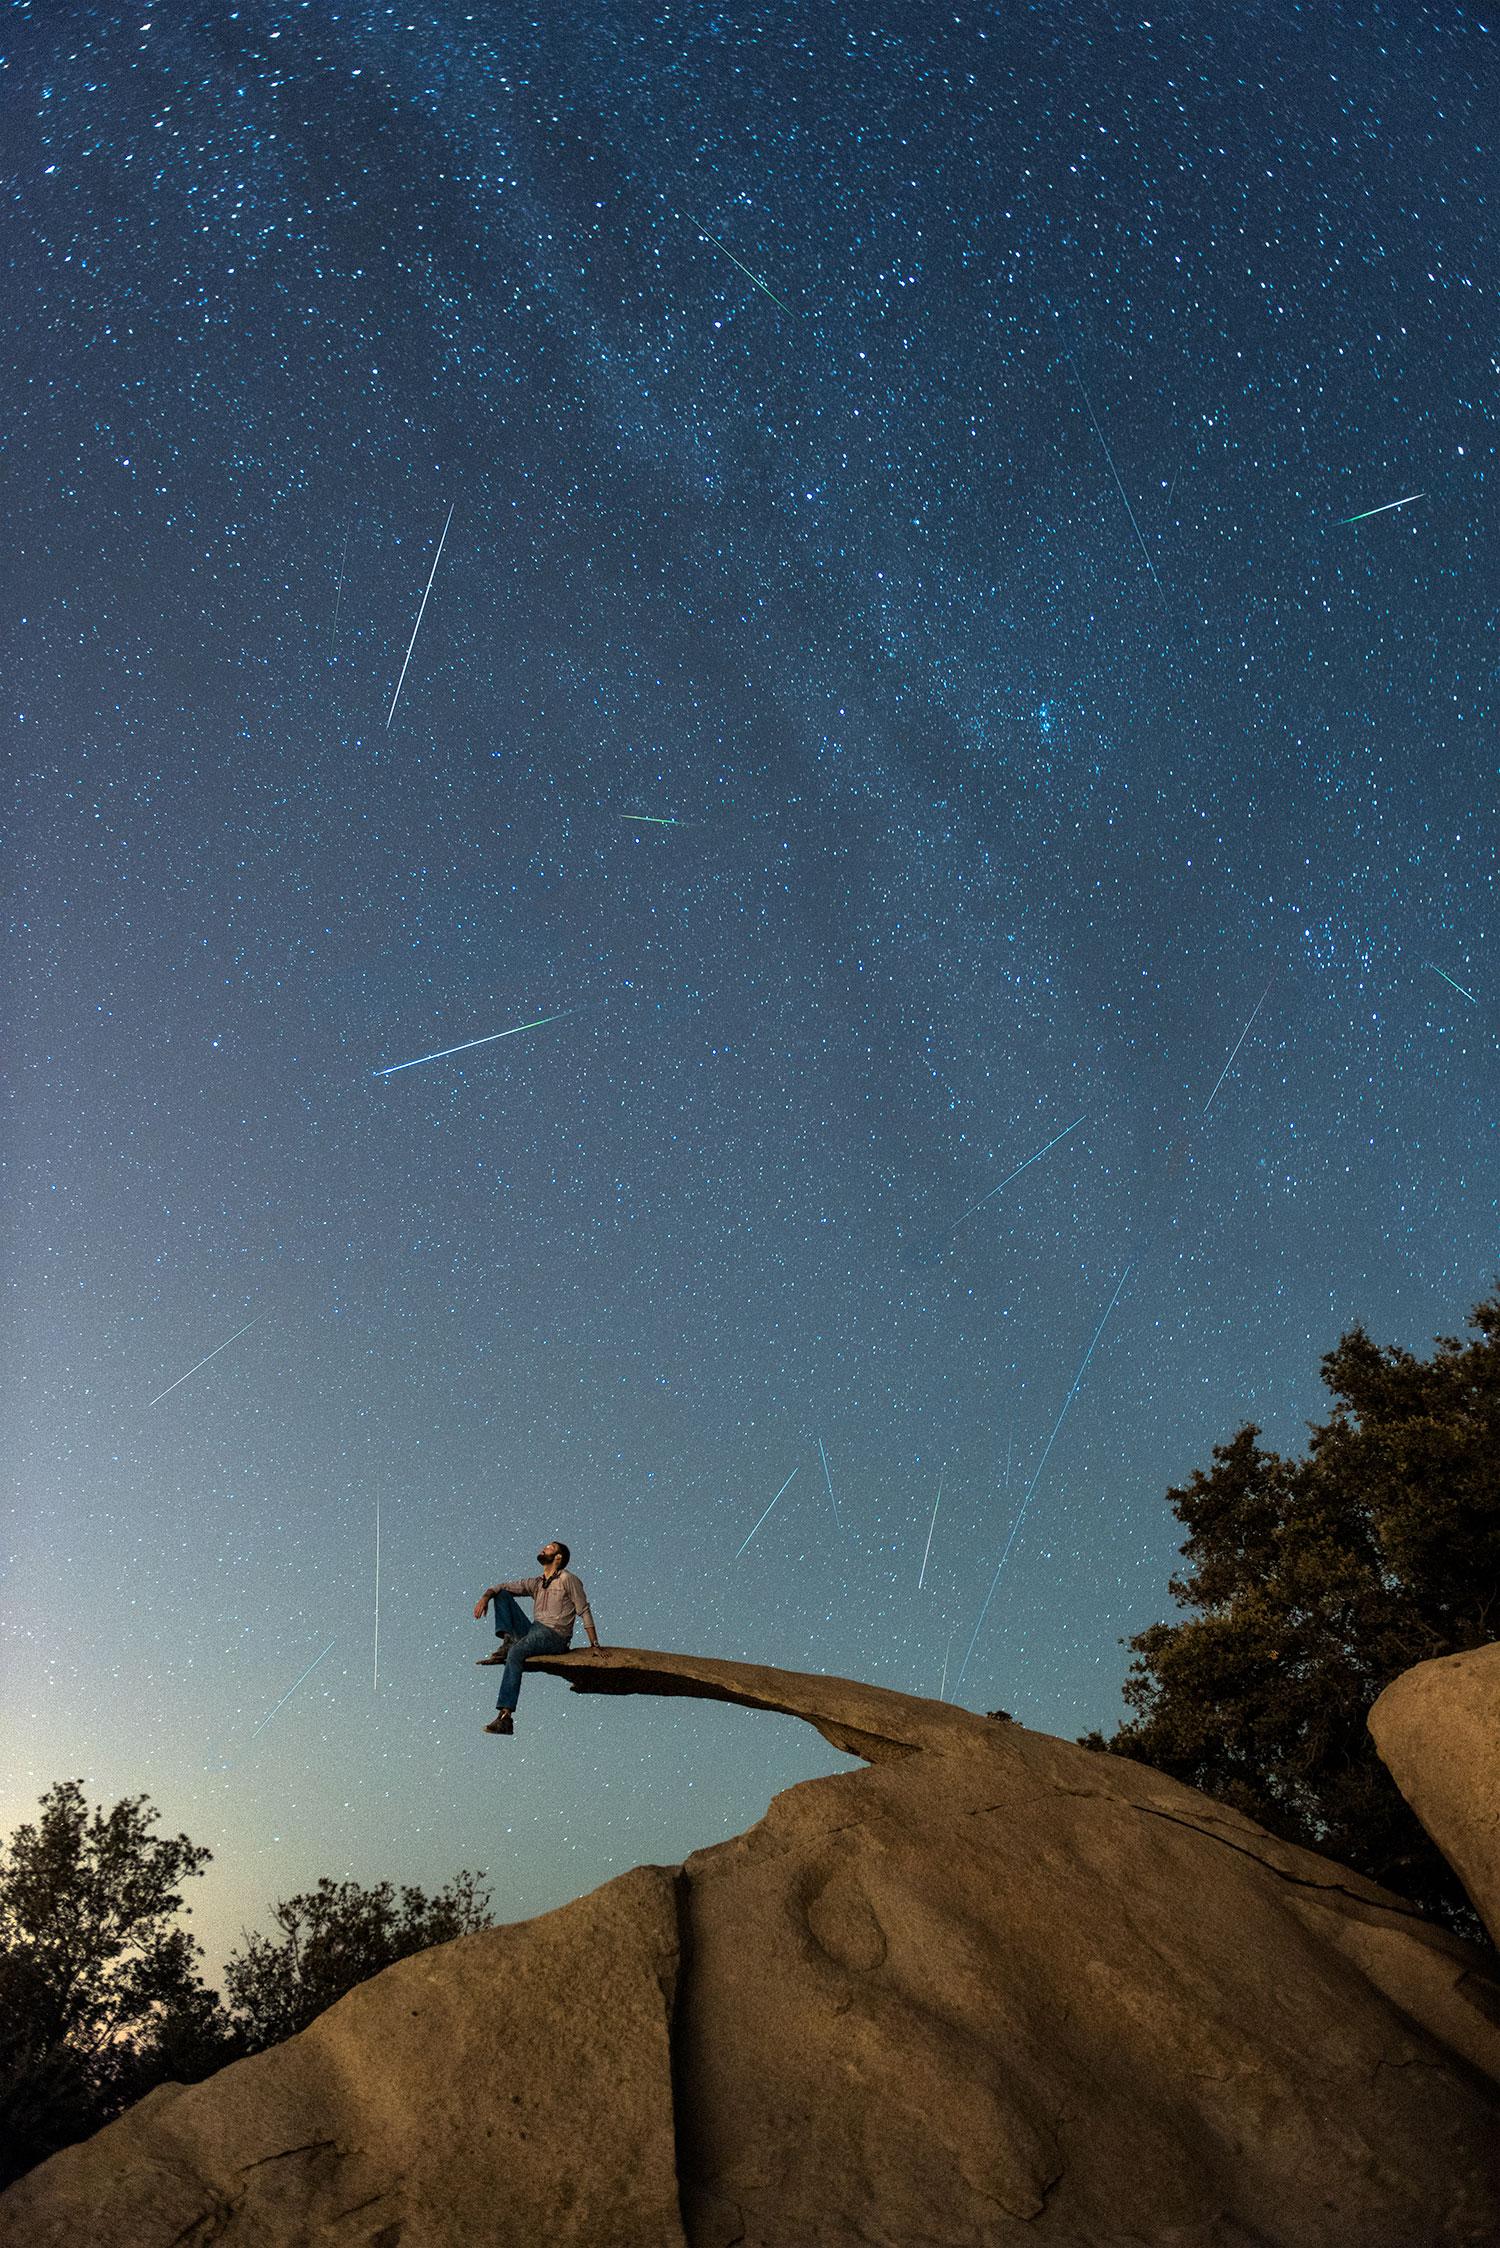 austin-trigg-southern-california-Perseids-meteor-shower-night-stars-Potato-Chip-rock-san-diego.jpg